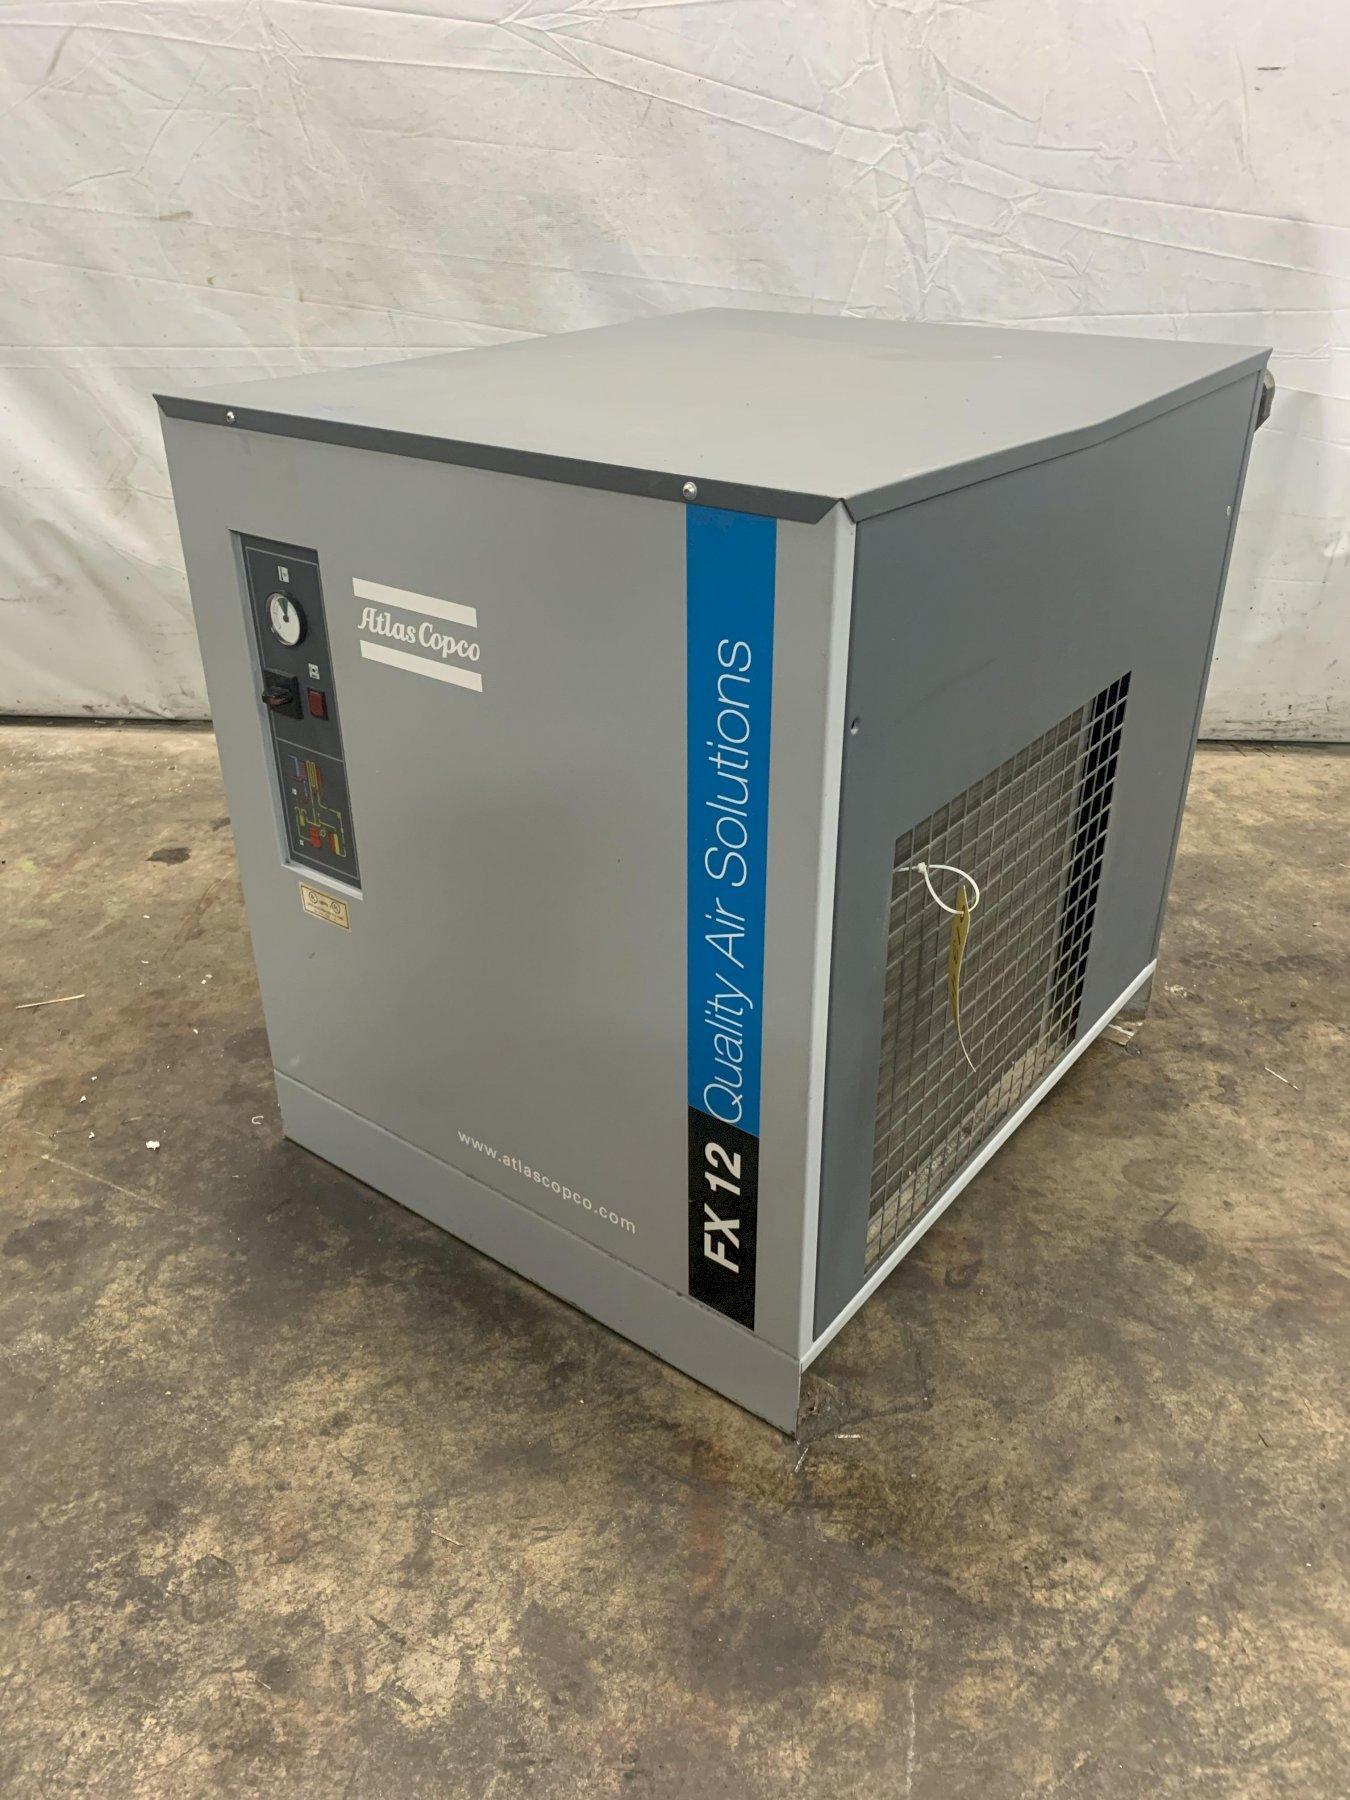 ATLAS COPCO MODEL #FX2 AIR DRYER: STOCK #13499